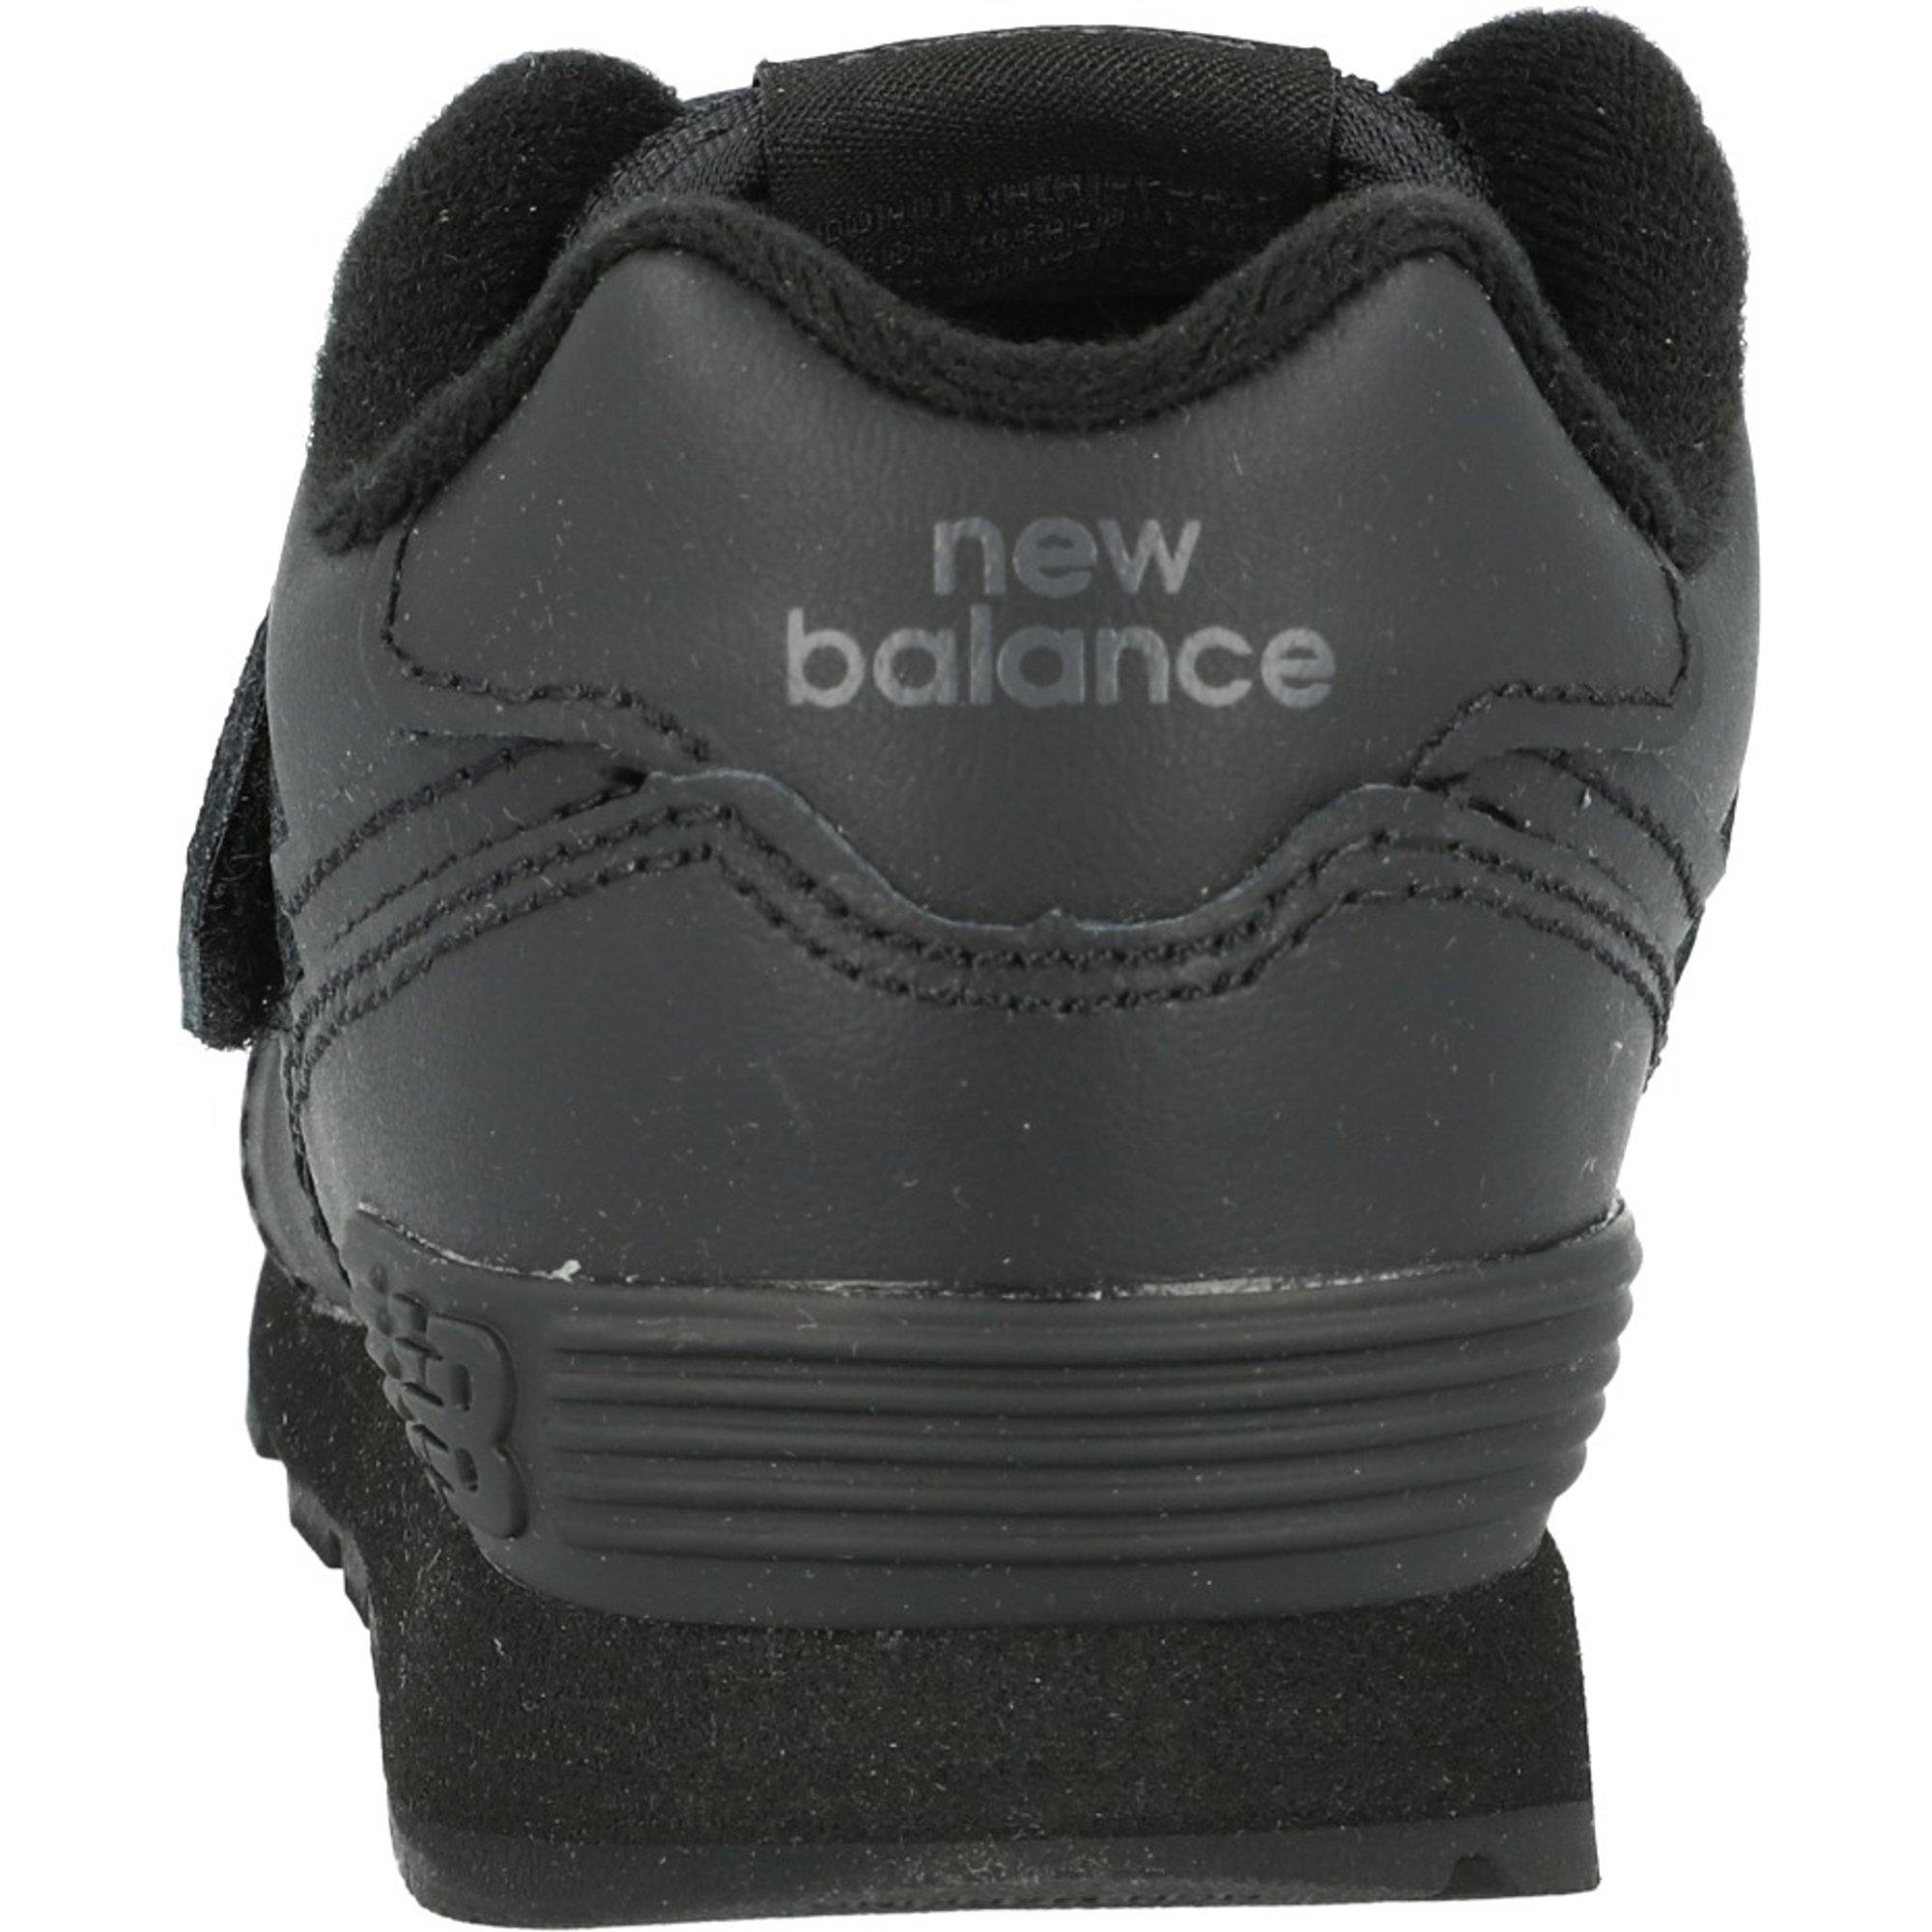 new balance 574 cuero negras